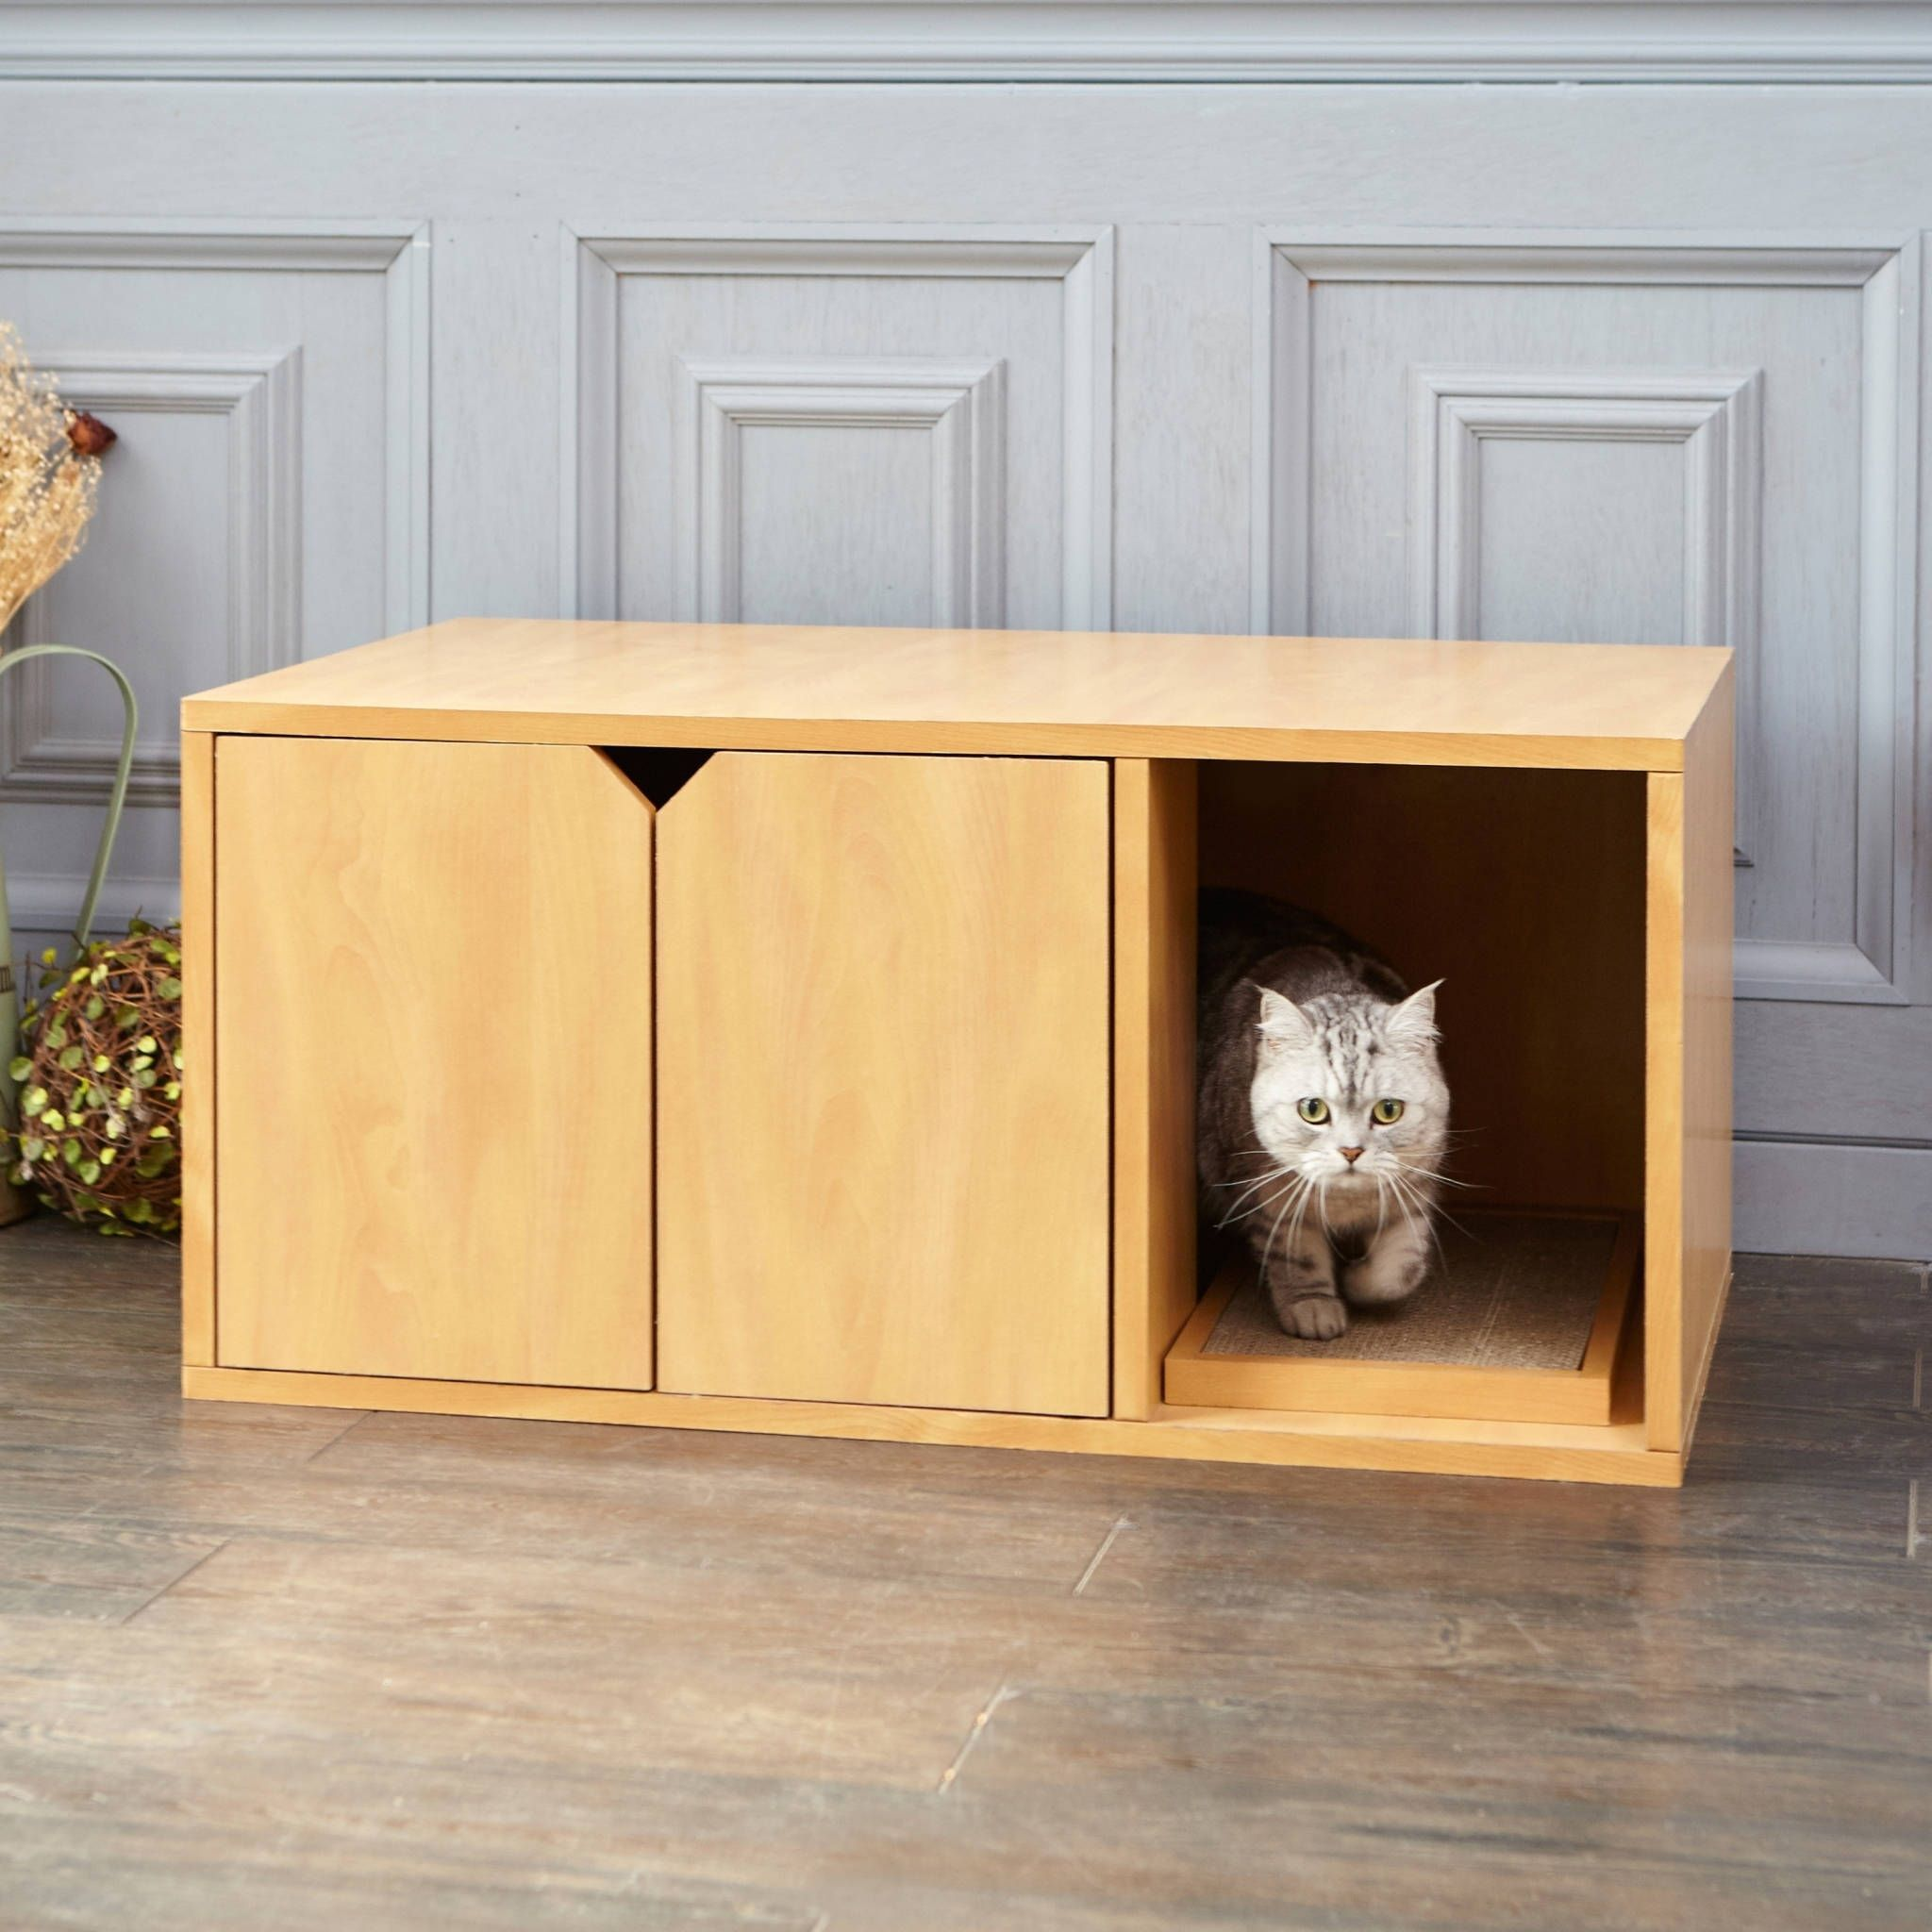 Way Basics Eco Modern Cat Litter Box Furniture Natural Lifetime Guarantee Embly Required Tan